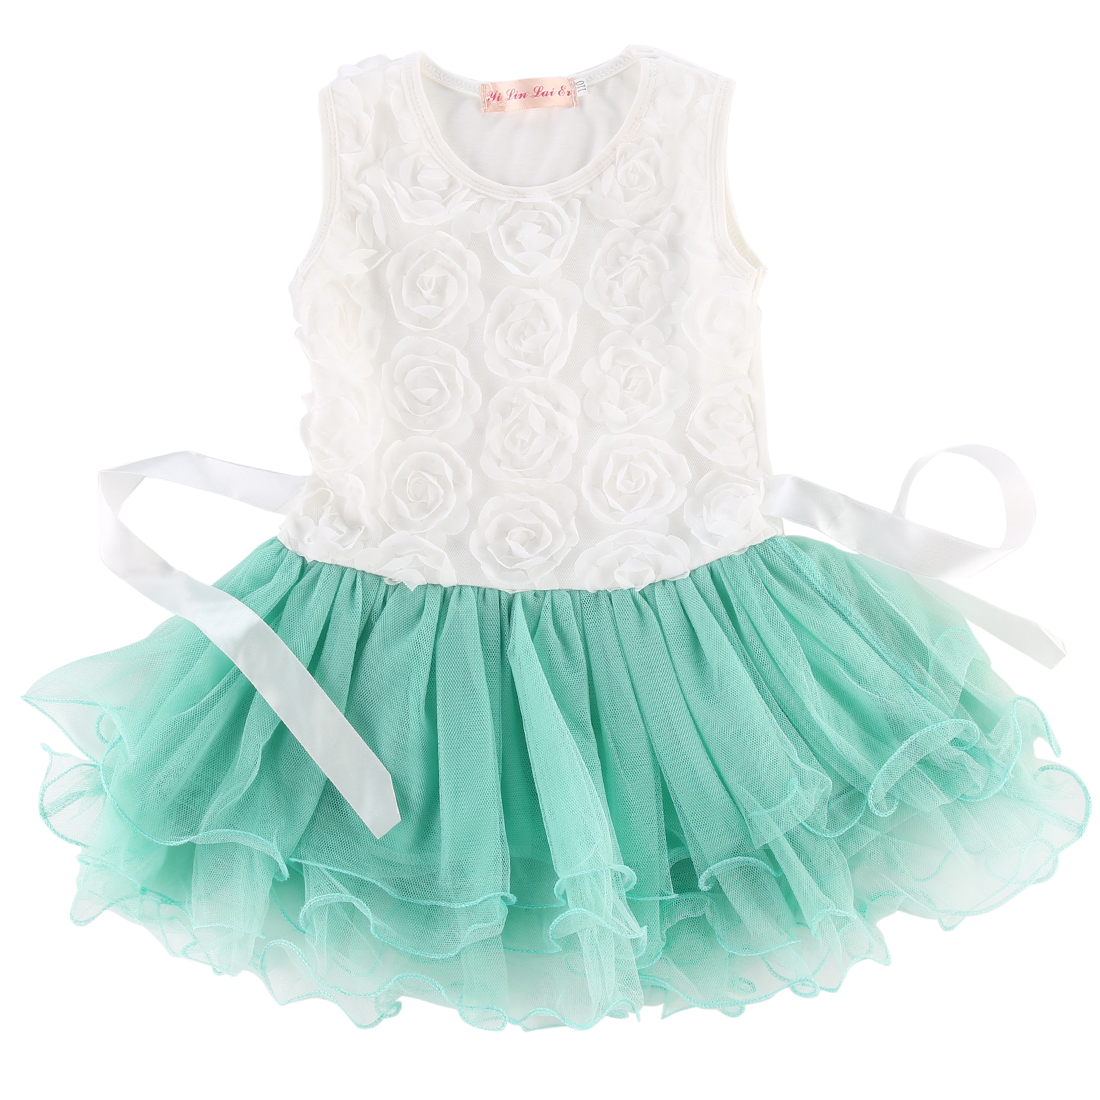 Flower Kids Baby Girl Summer Dresses Princess Bridesmaid Petal Tulle ...